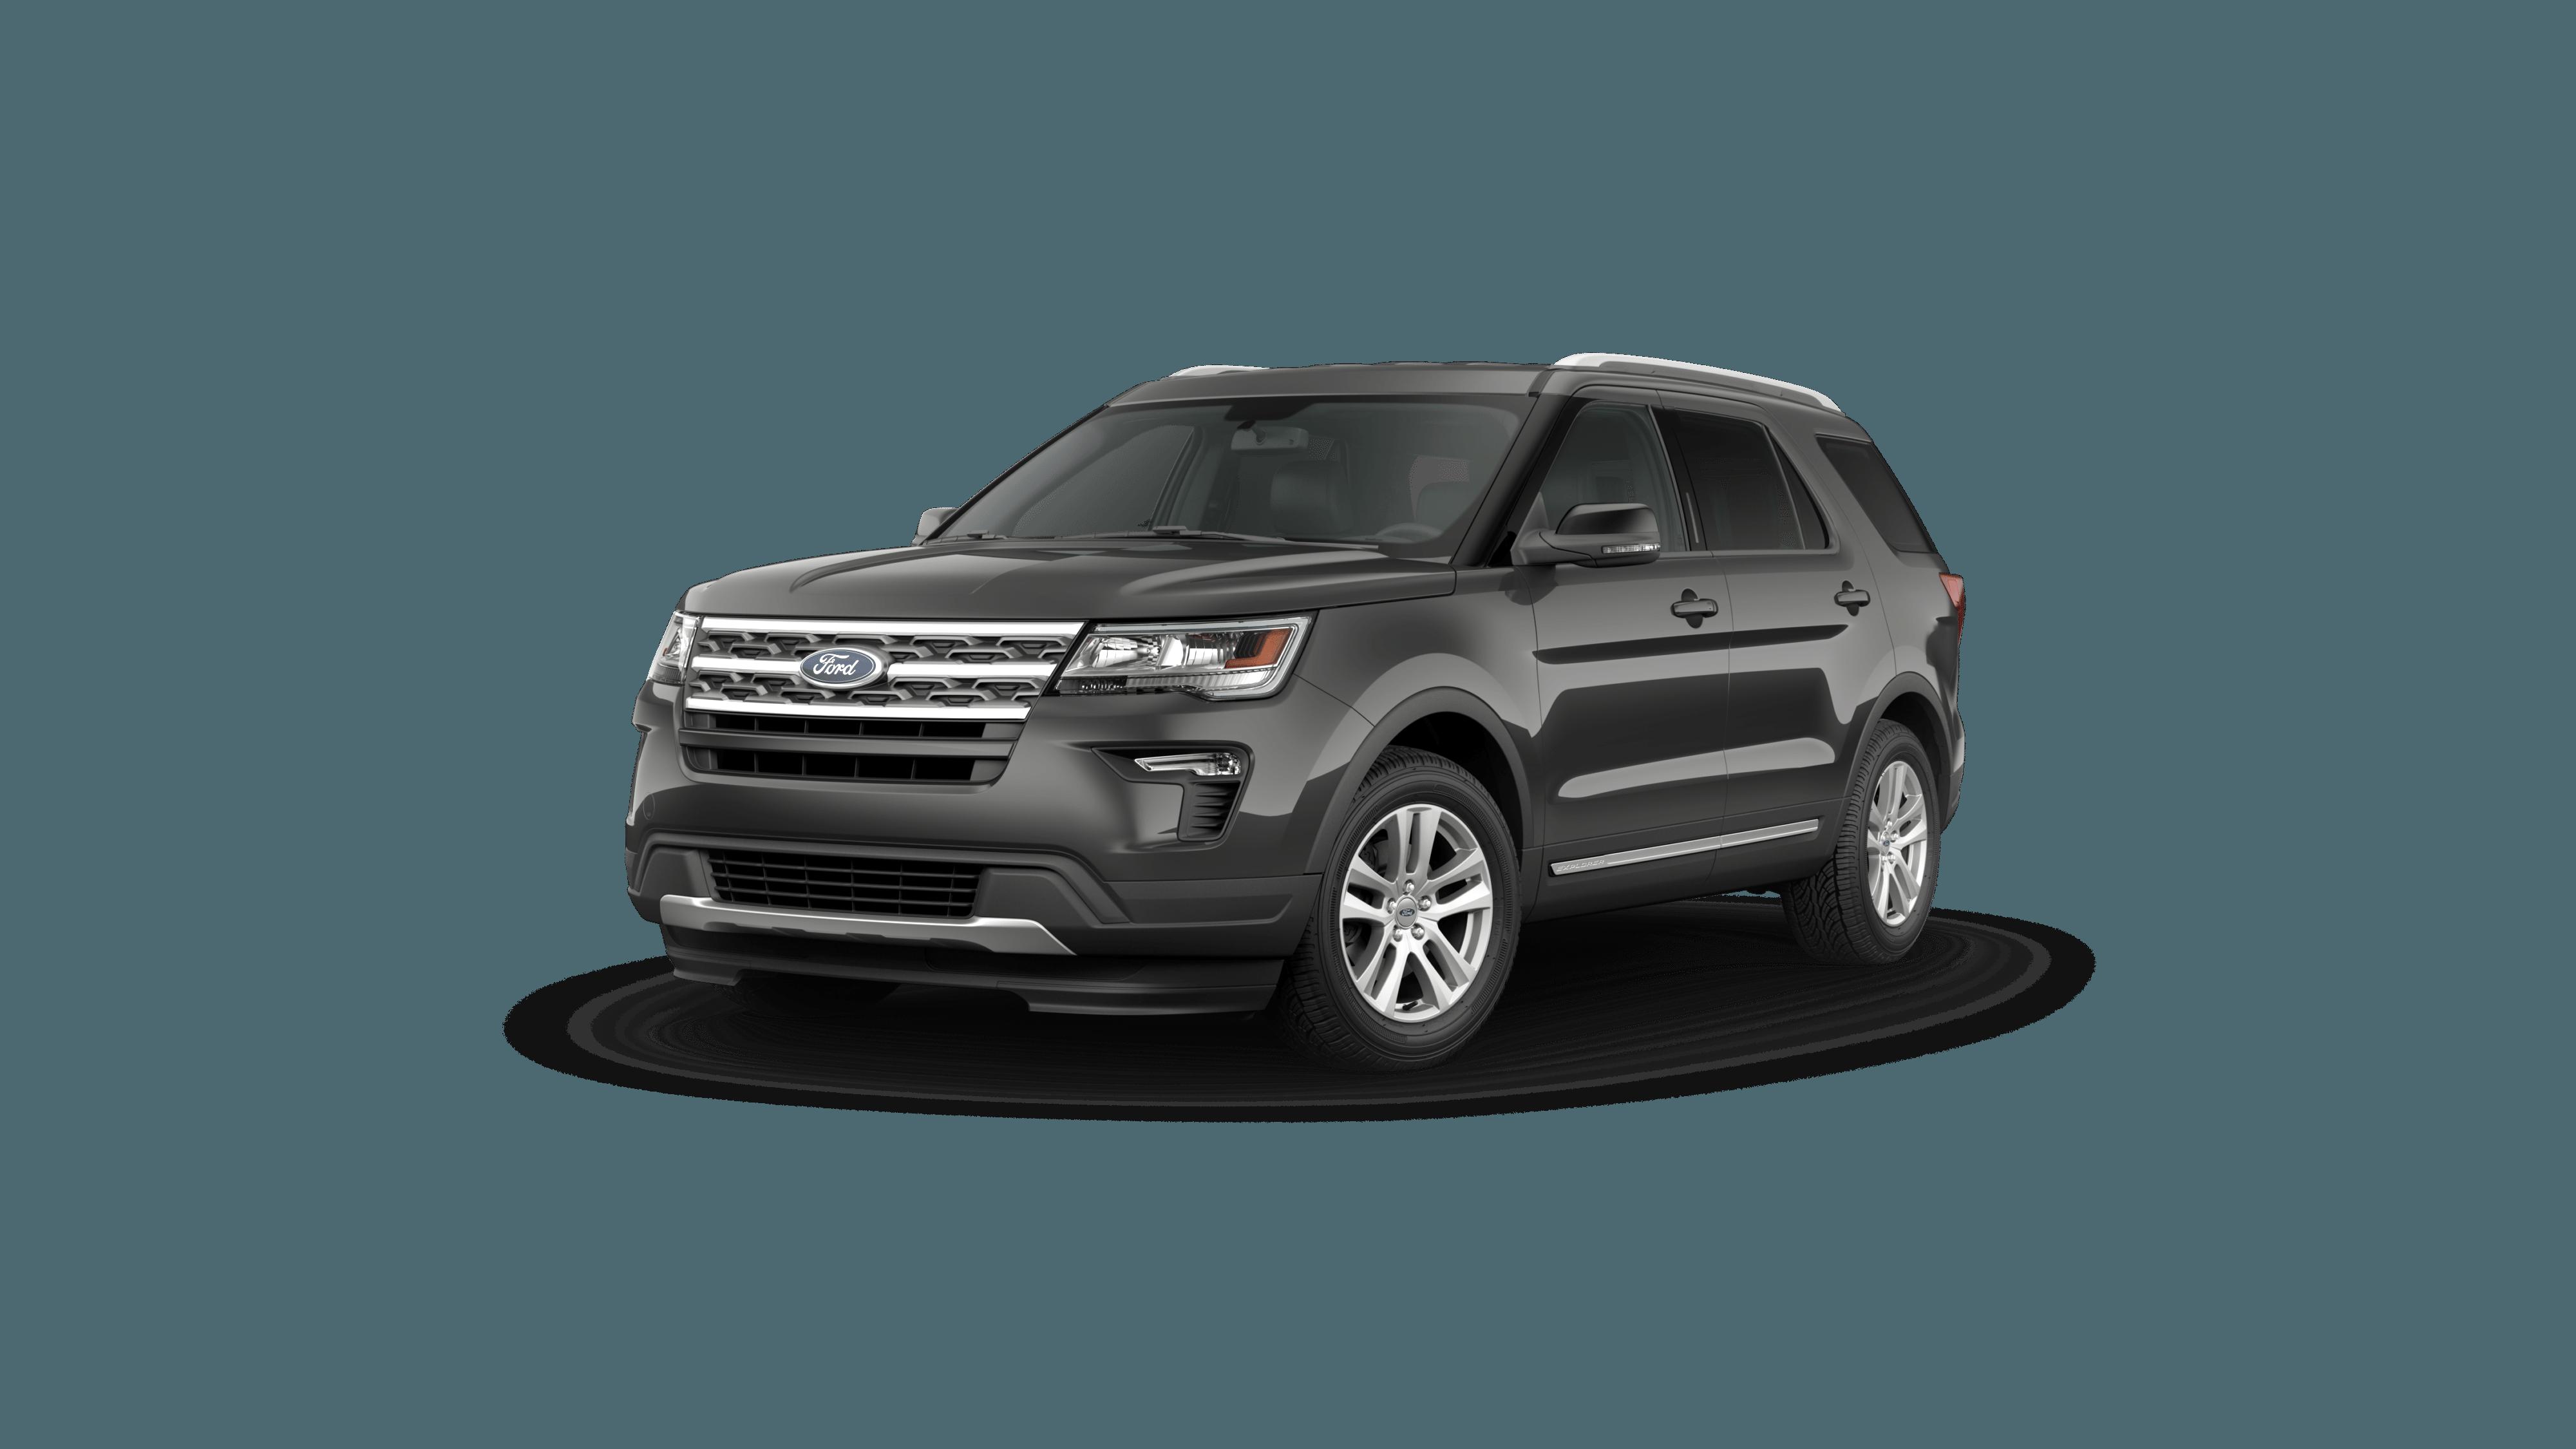 2018 ford explorer vehicle photo in sierra vista az 85635 3643